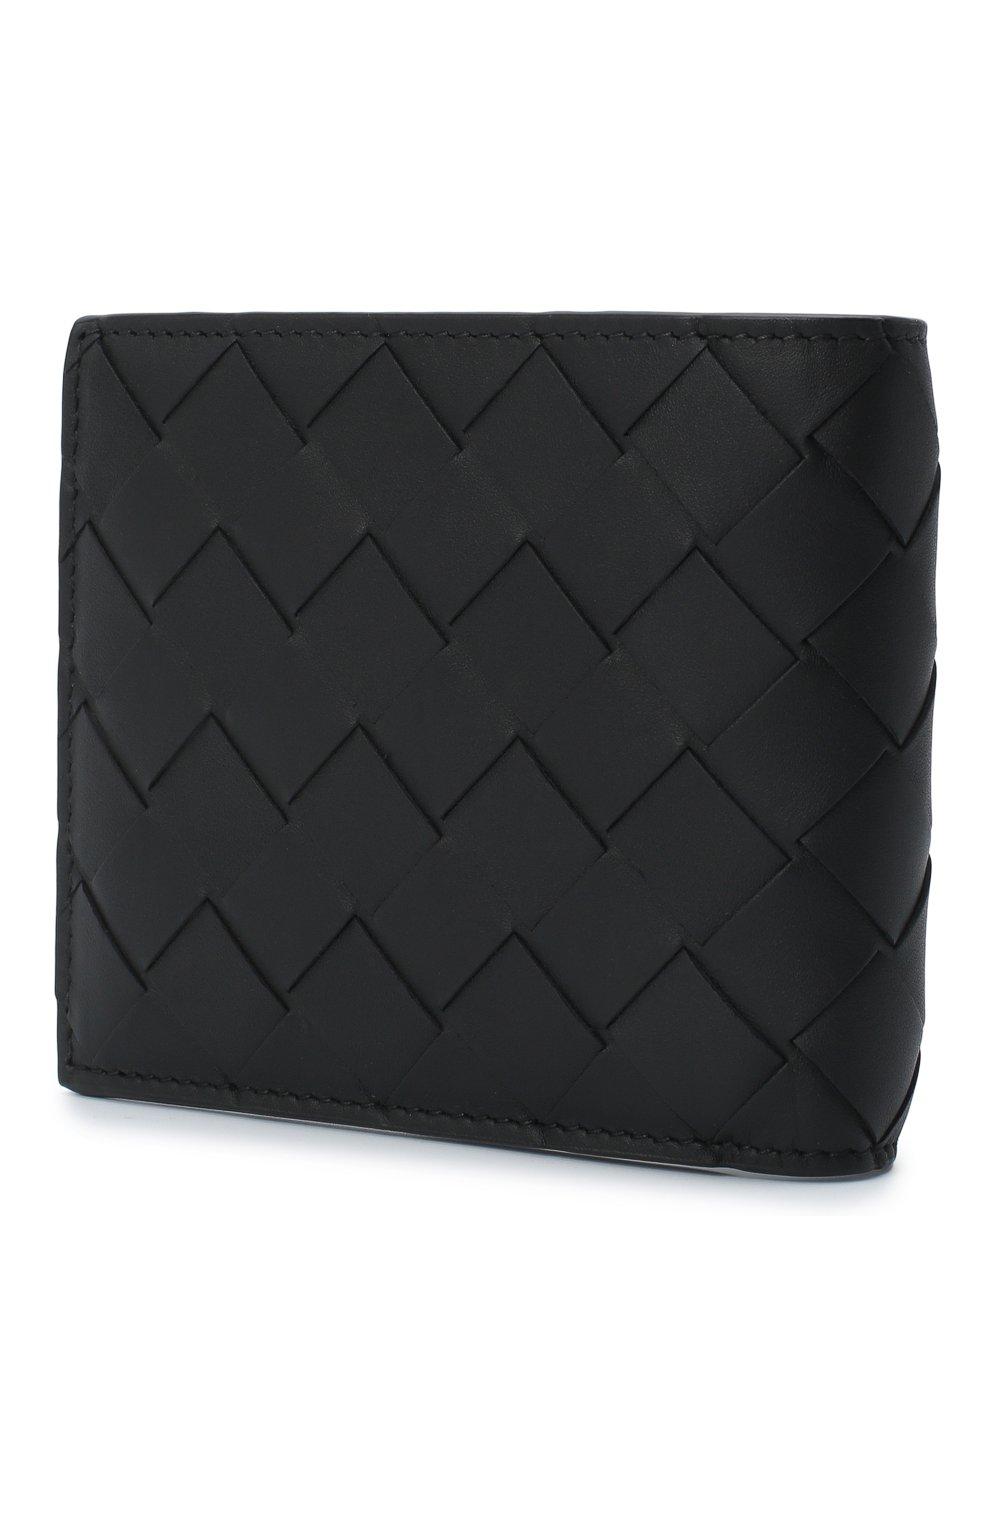 Мужской кожаное портмоне BOTTEGA VENETA черного цвета, арт. 605721/VCPQ4   Фото 2